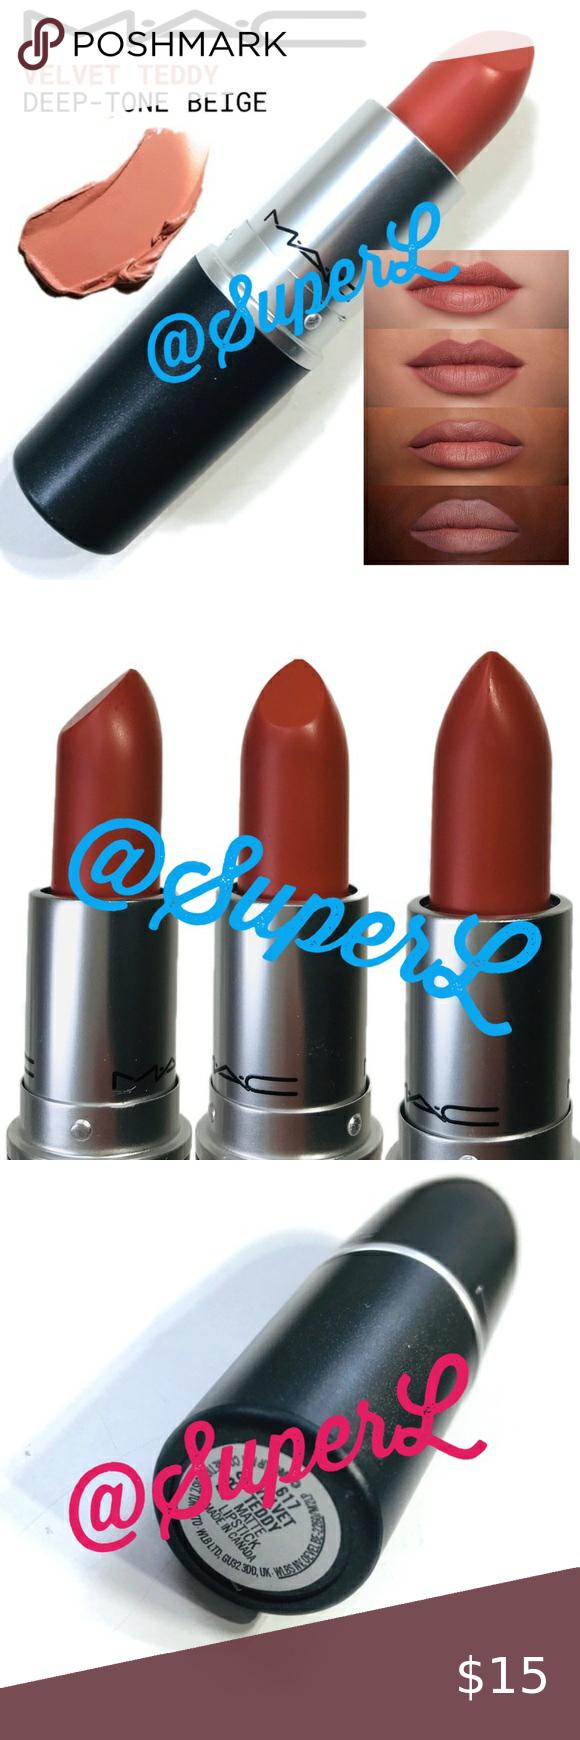 Non Sticky Natural Nude Makeup Liquid Lipsticks